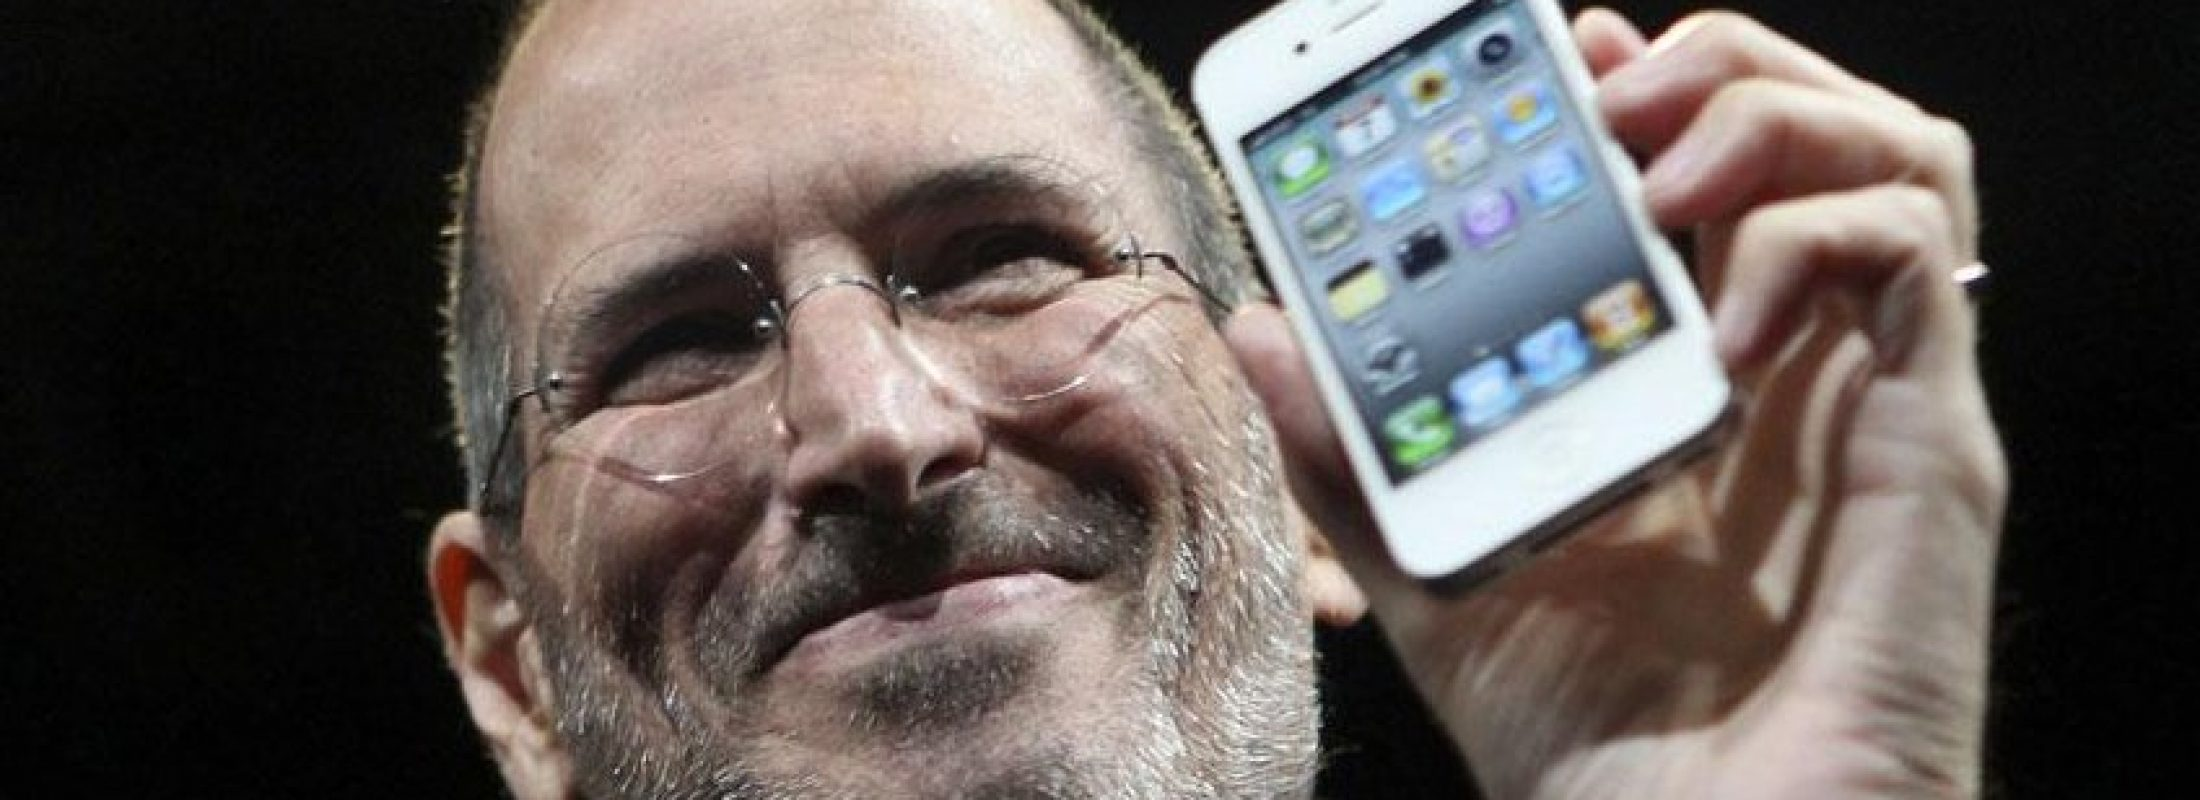 500 bin liralık iPhone 4